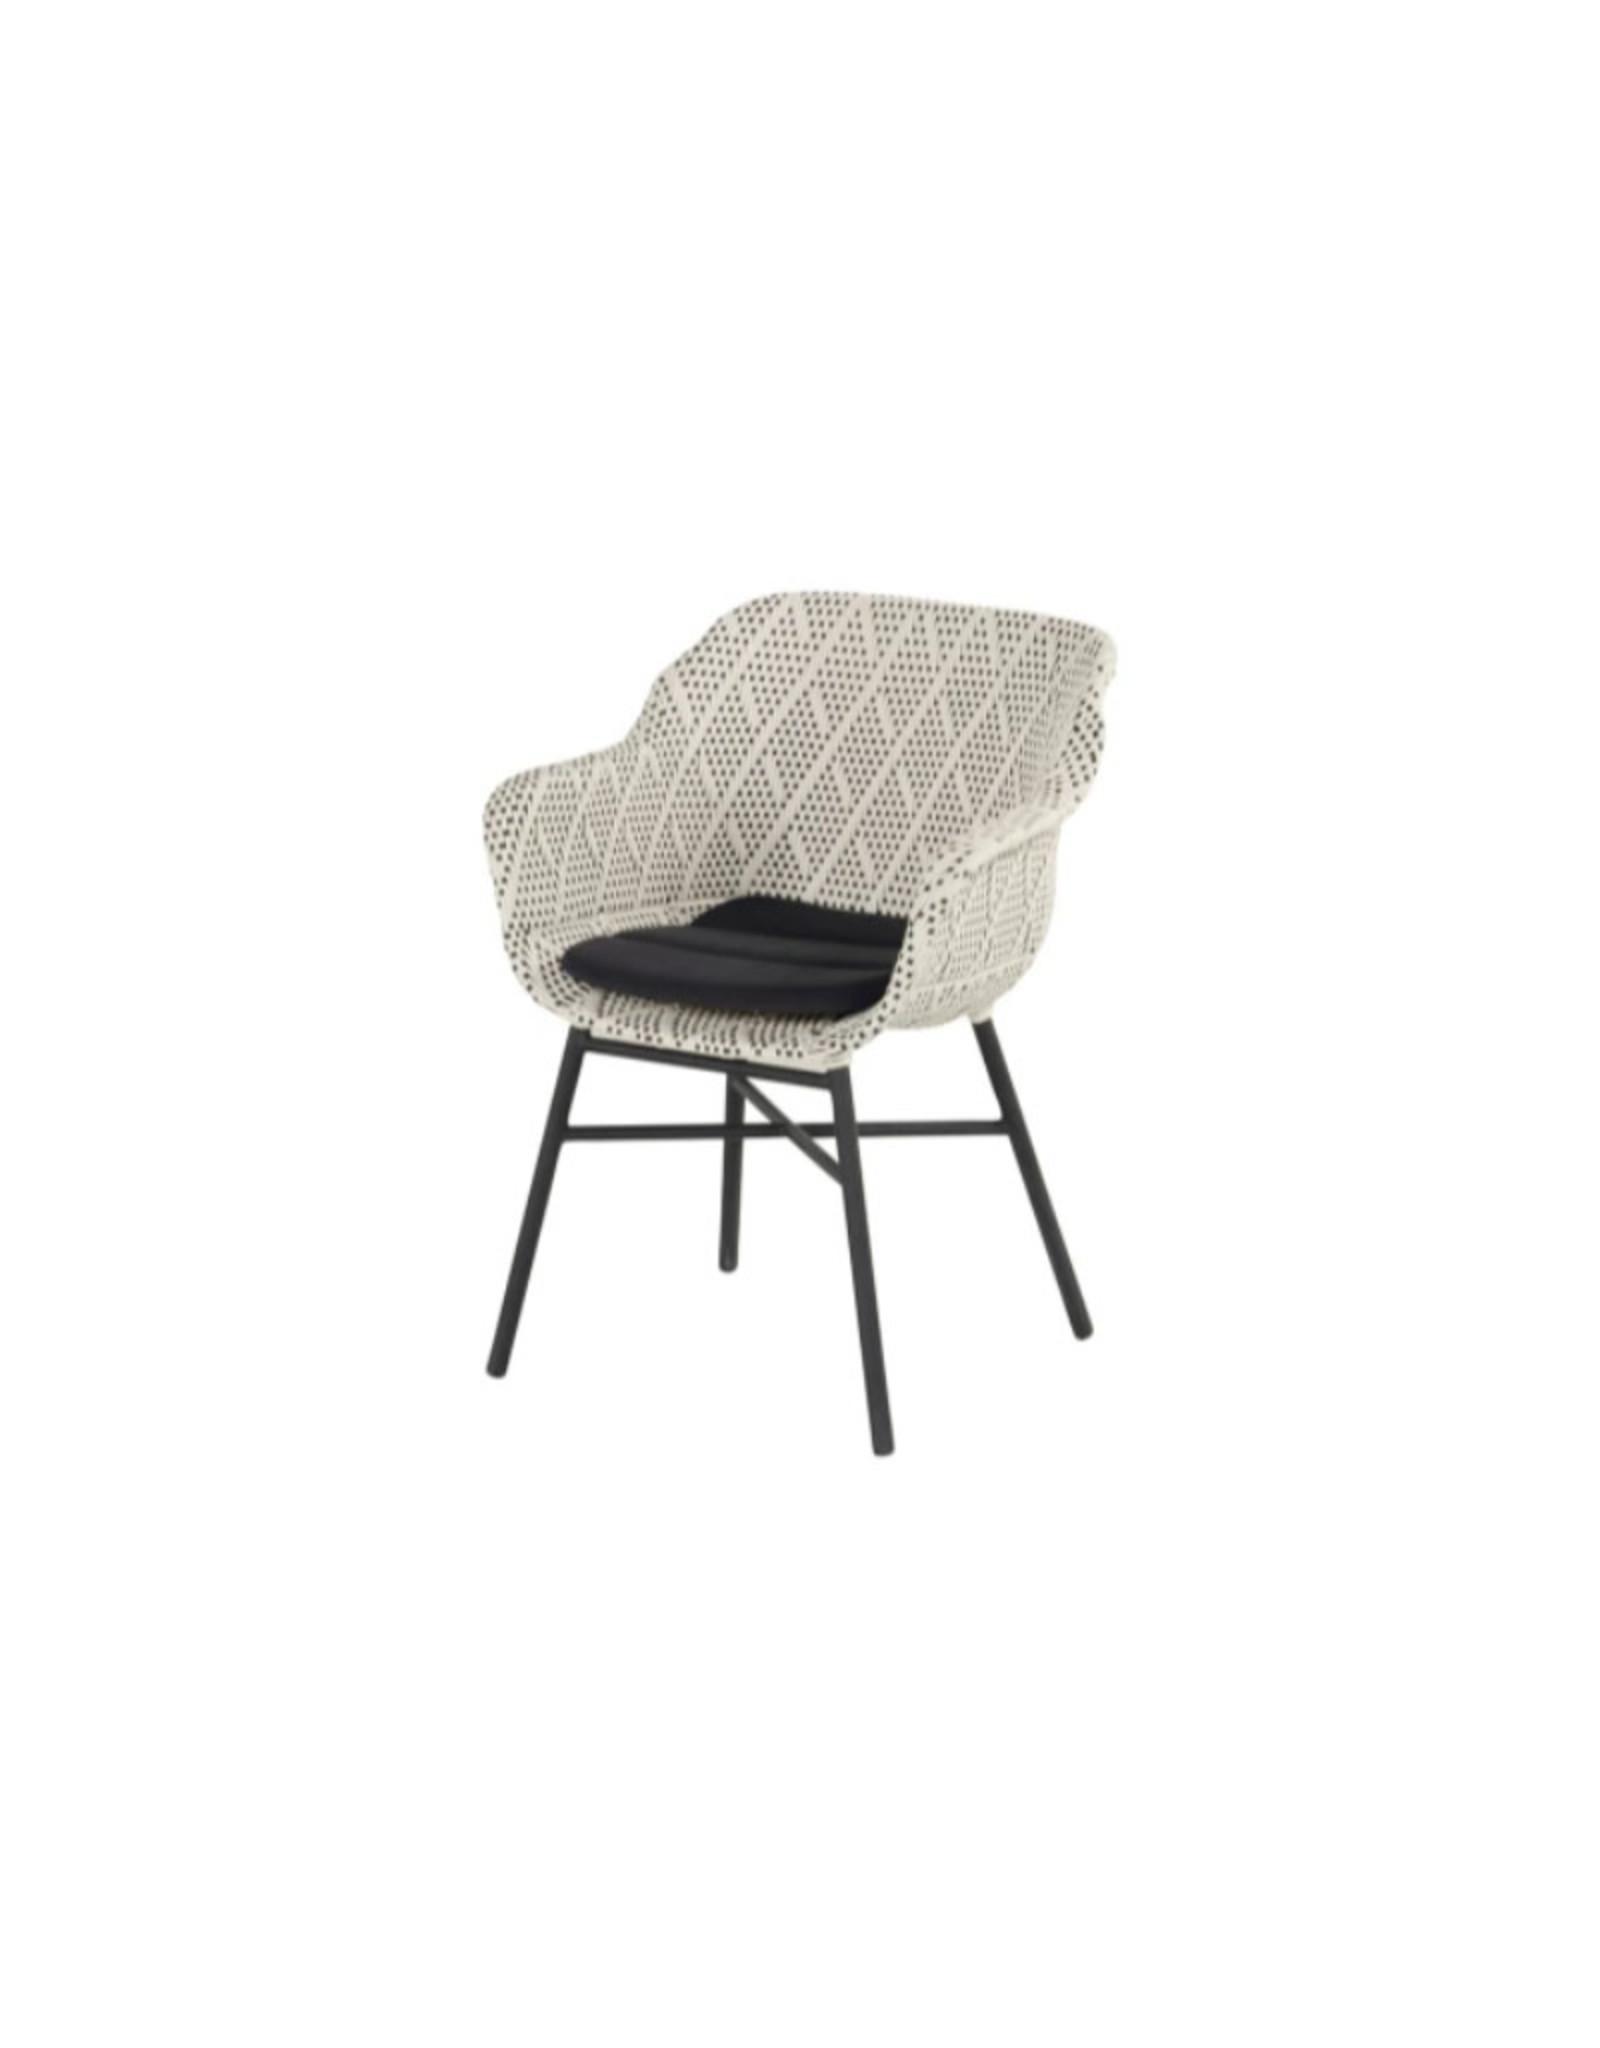 Hartman Hartman Delphine Segment Cushion with anti slip, 3cm thick grijs